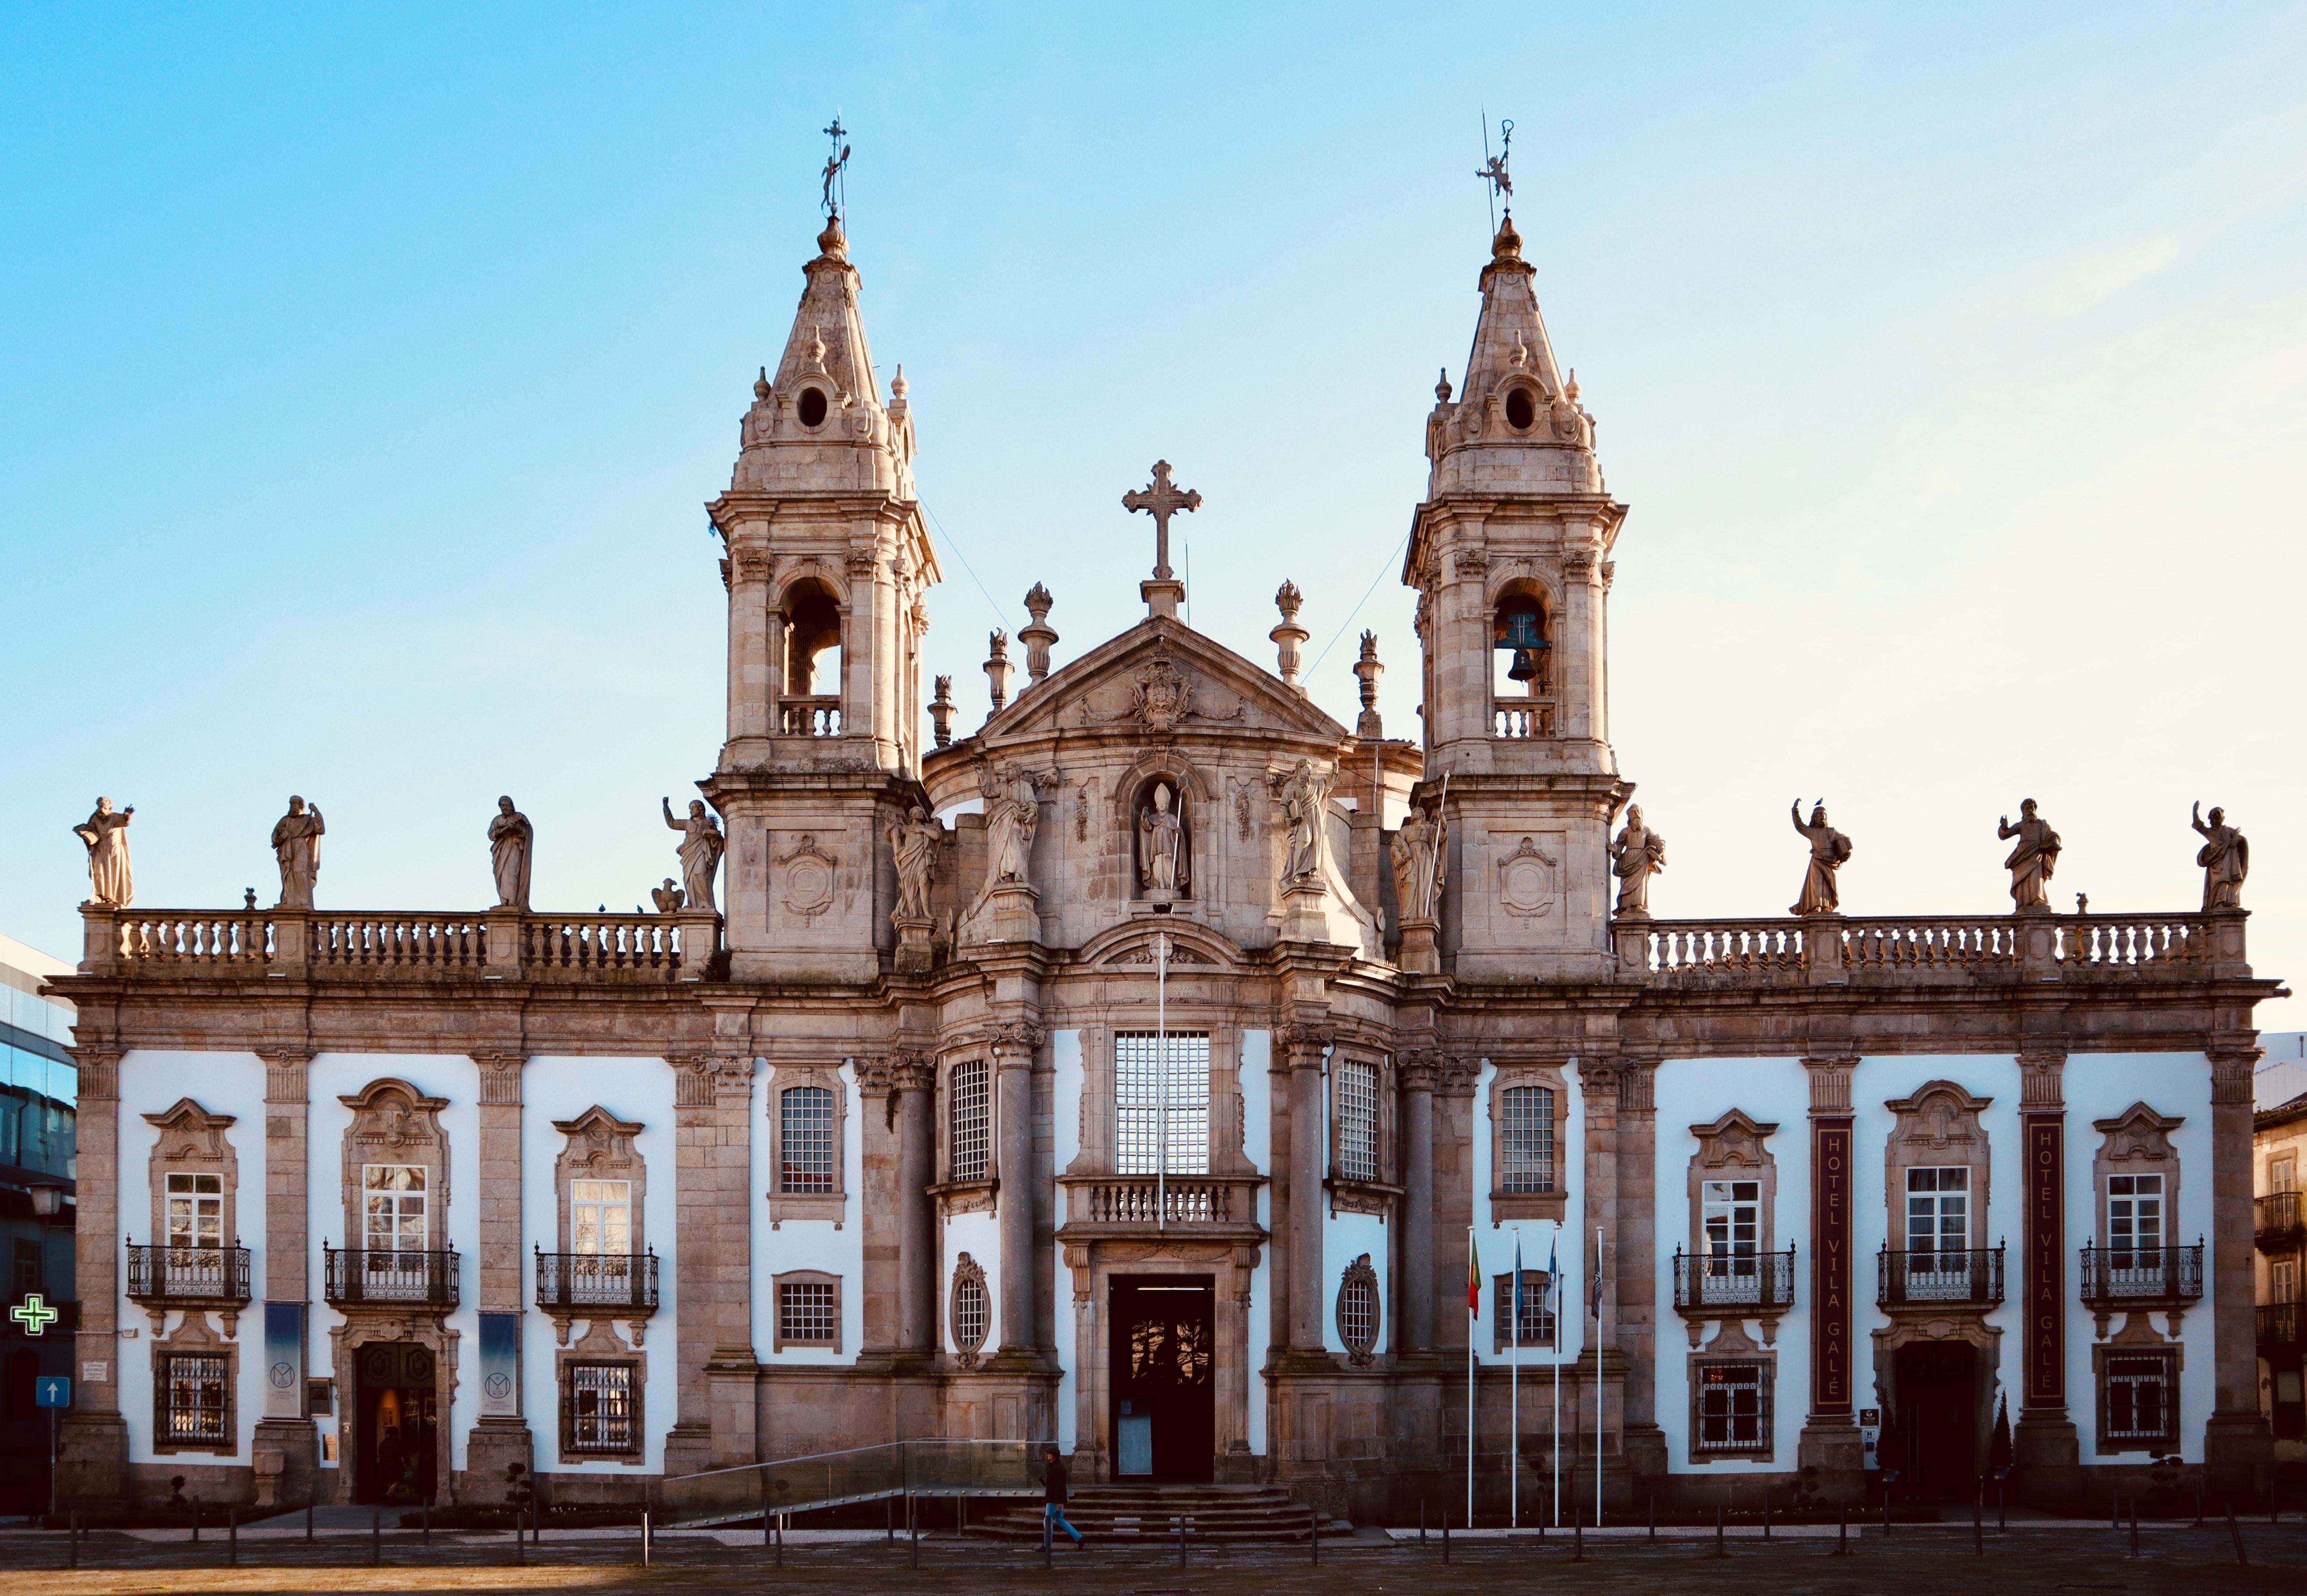 Igreja de São Marcos (Igreja do Hospital), Braga / Photo by Rui Sousa on Unsplash